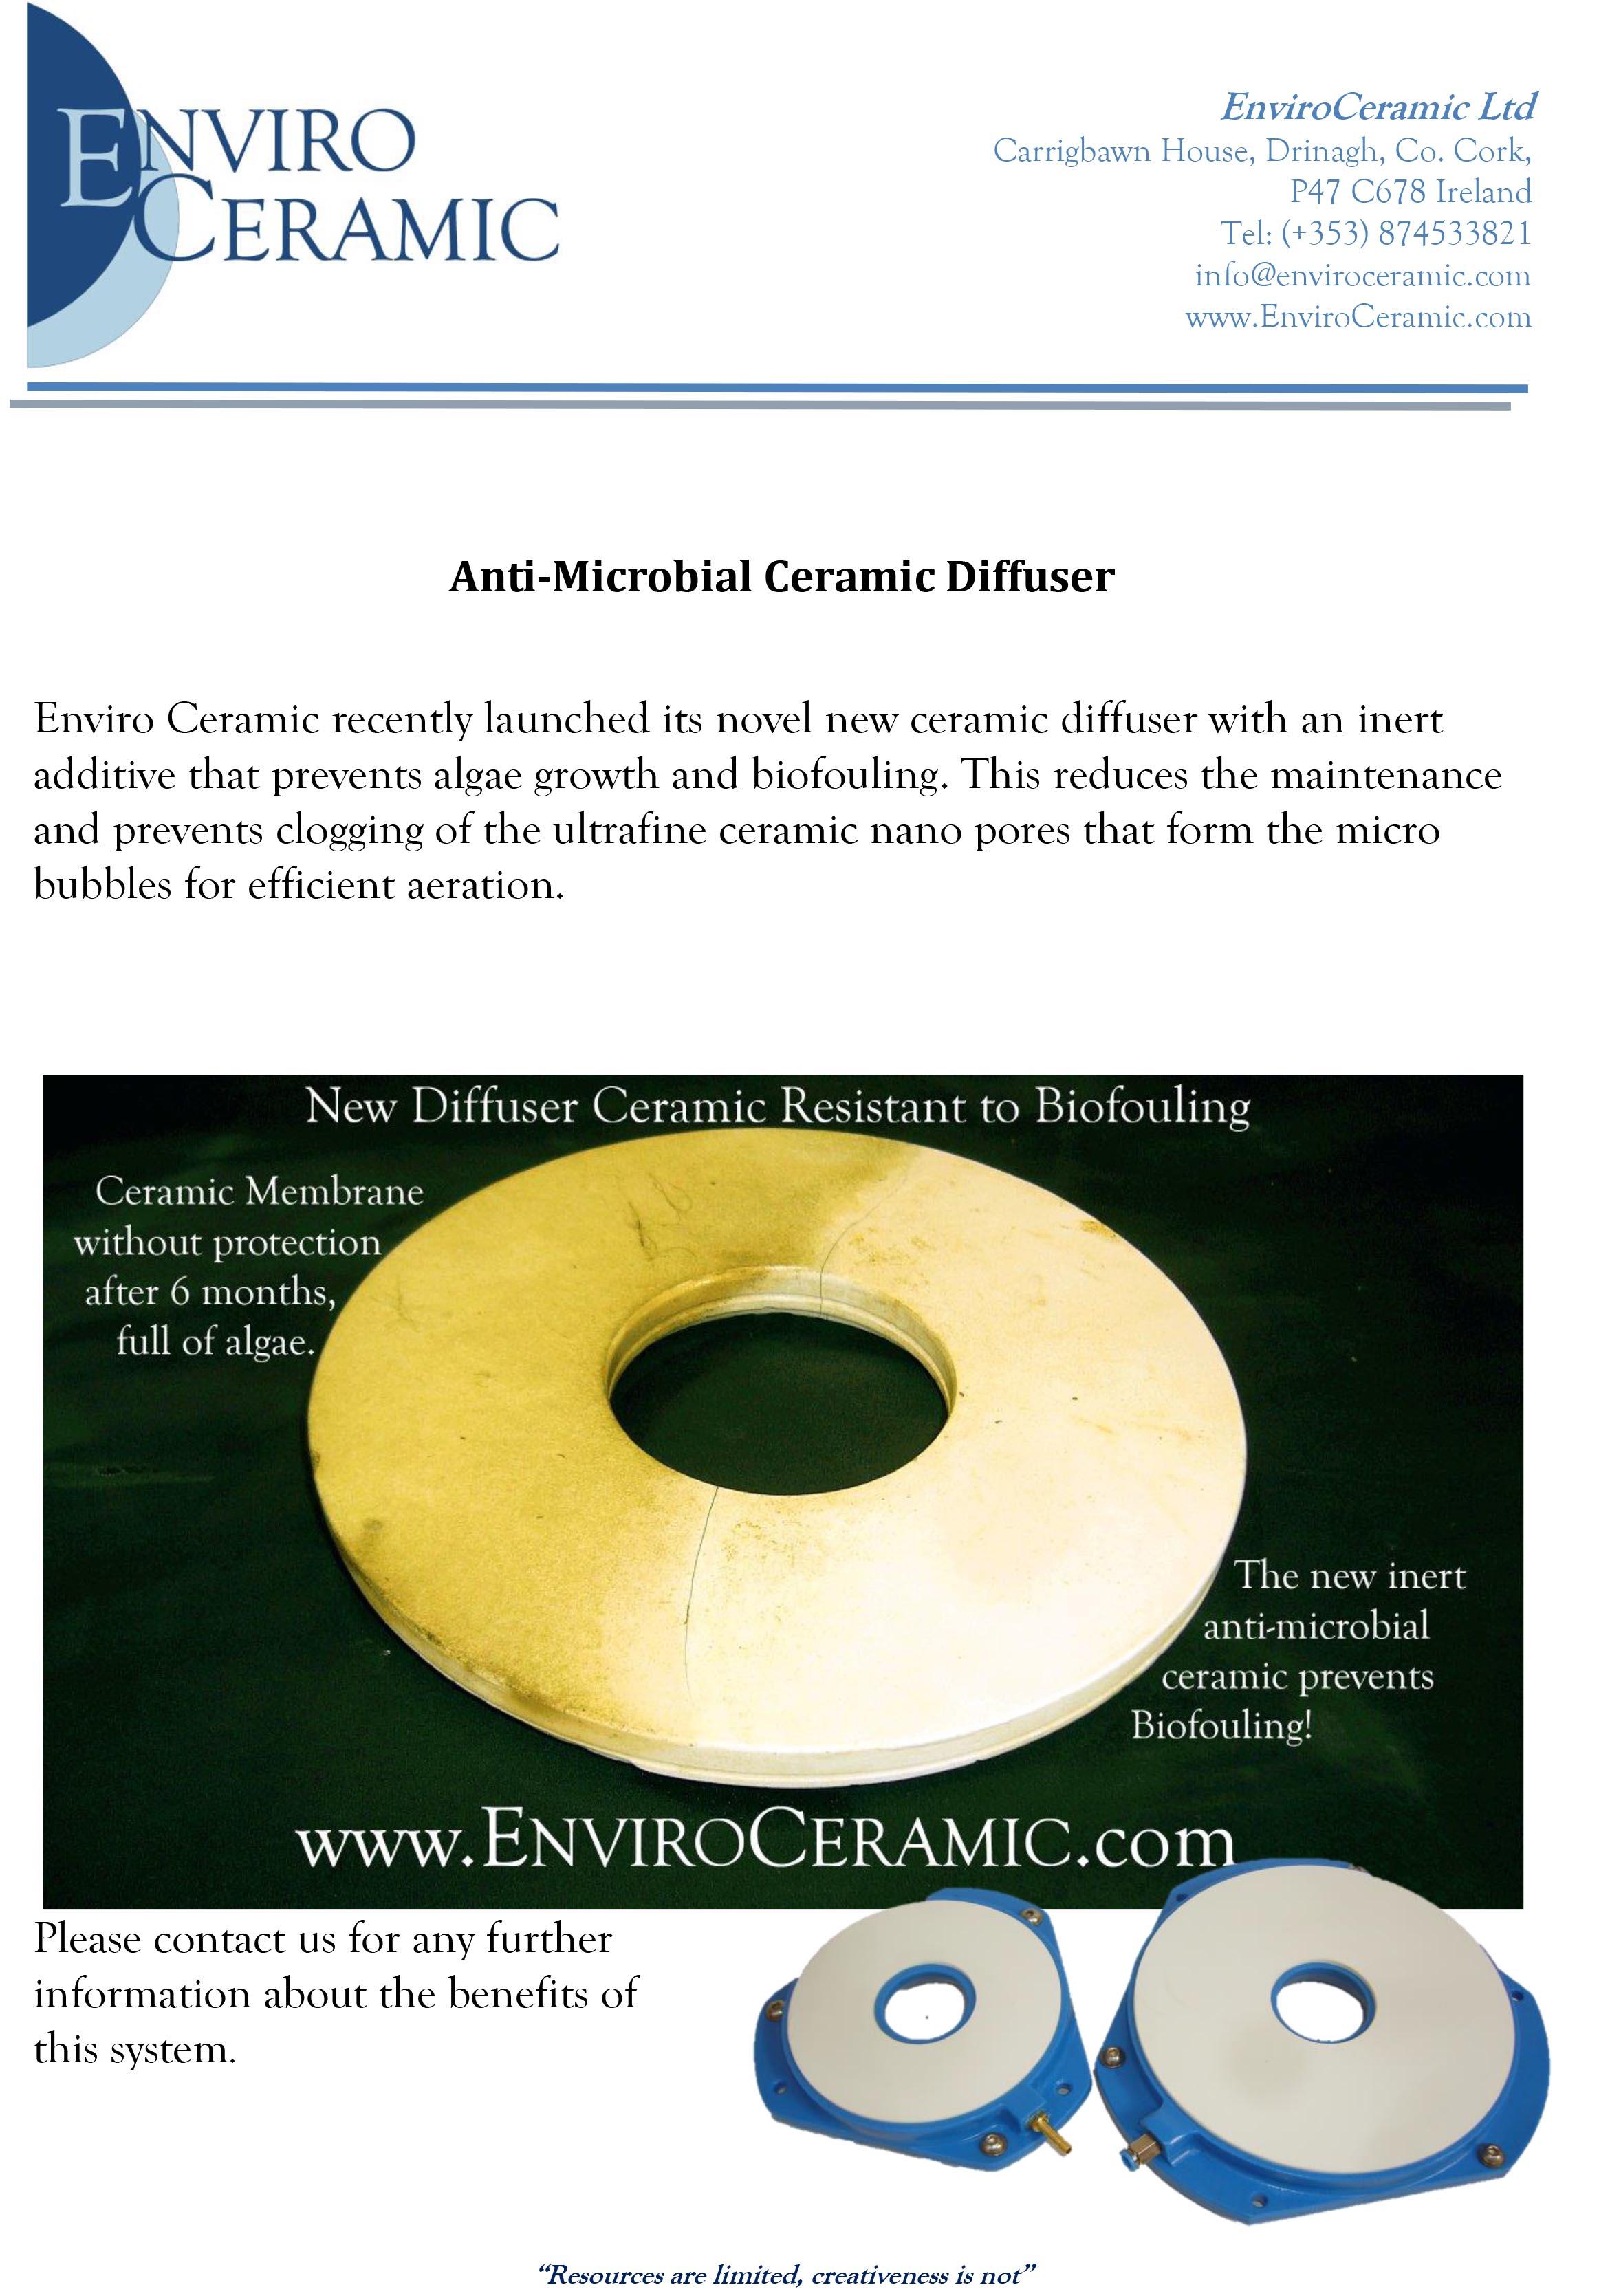 Anti-Microbial Ceramic Diffuser